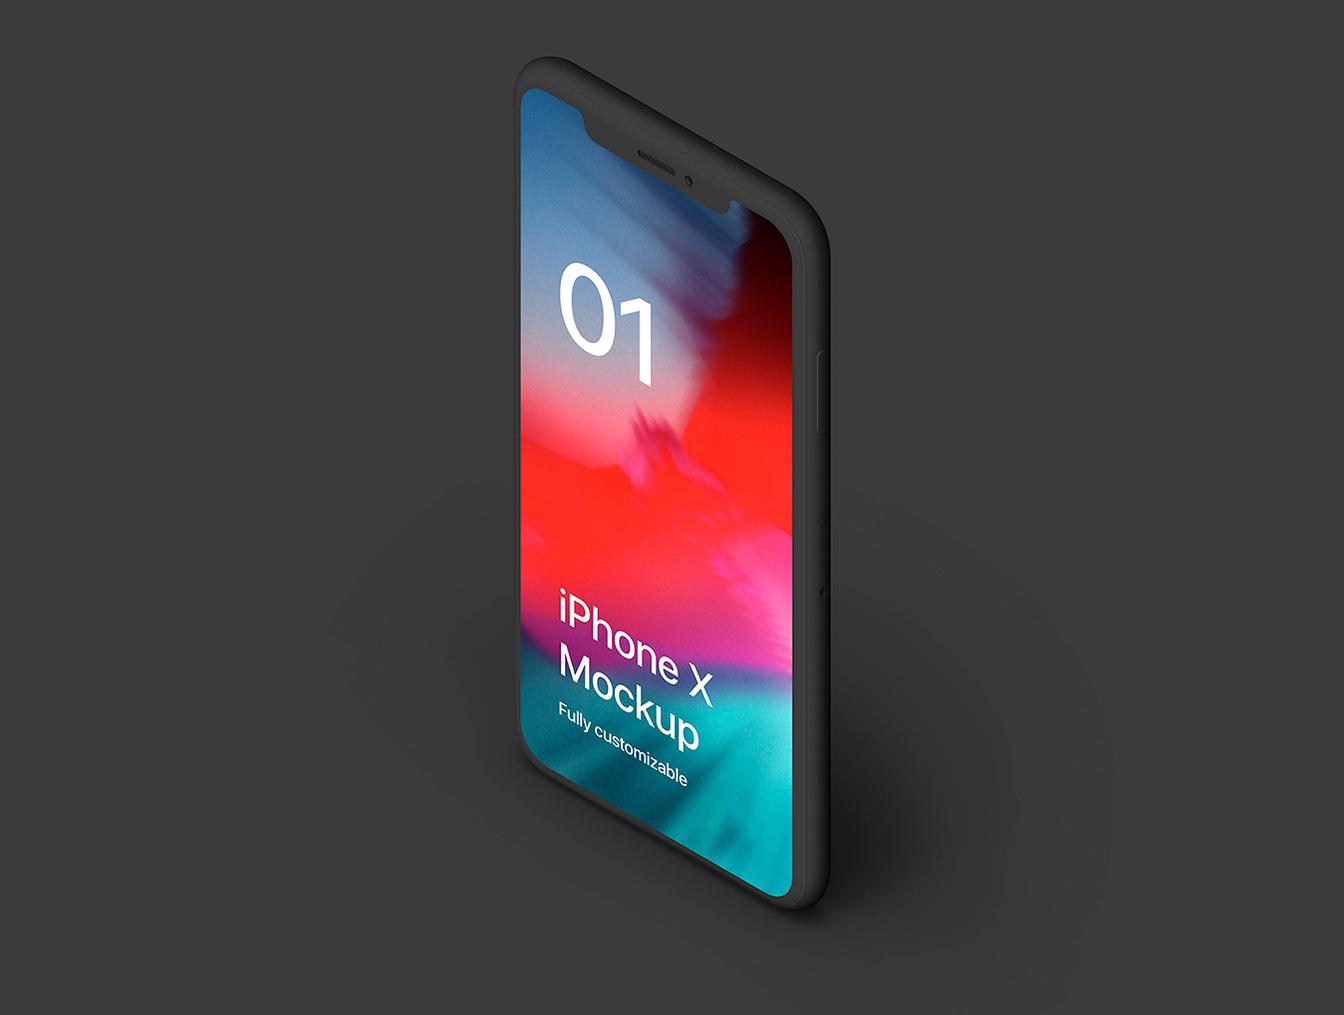 iPhone X Clay 20组 Mockups.psd素材下载 样机素材-第3张